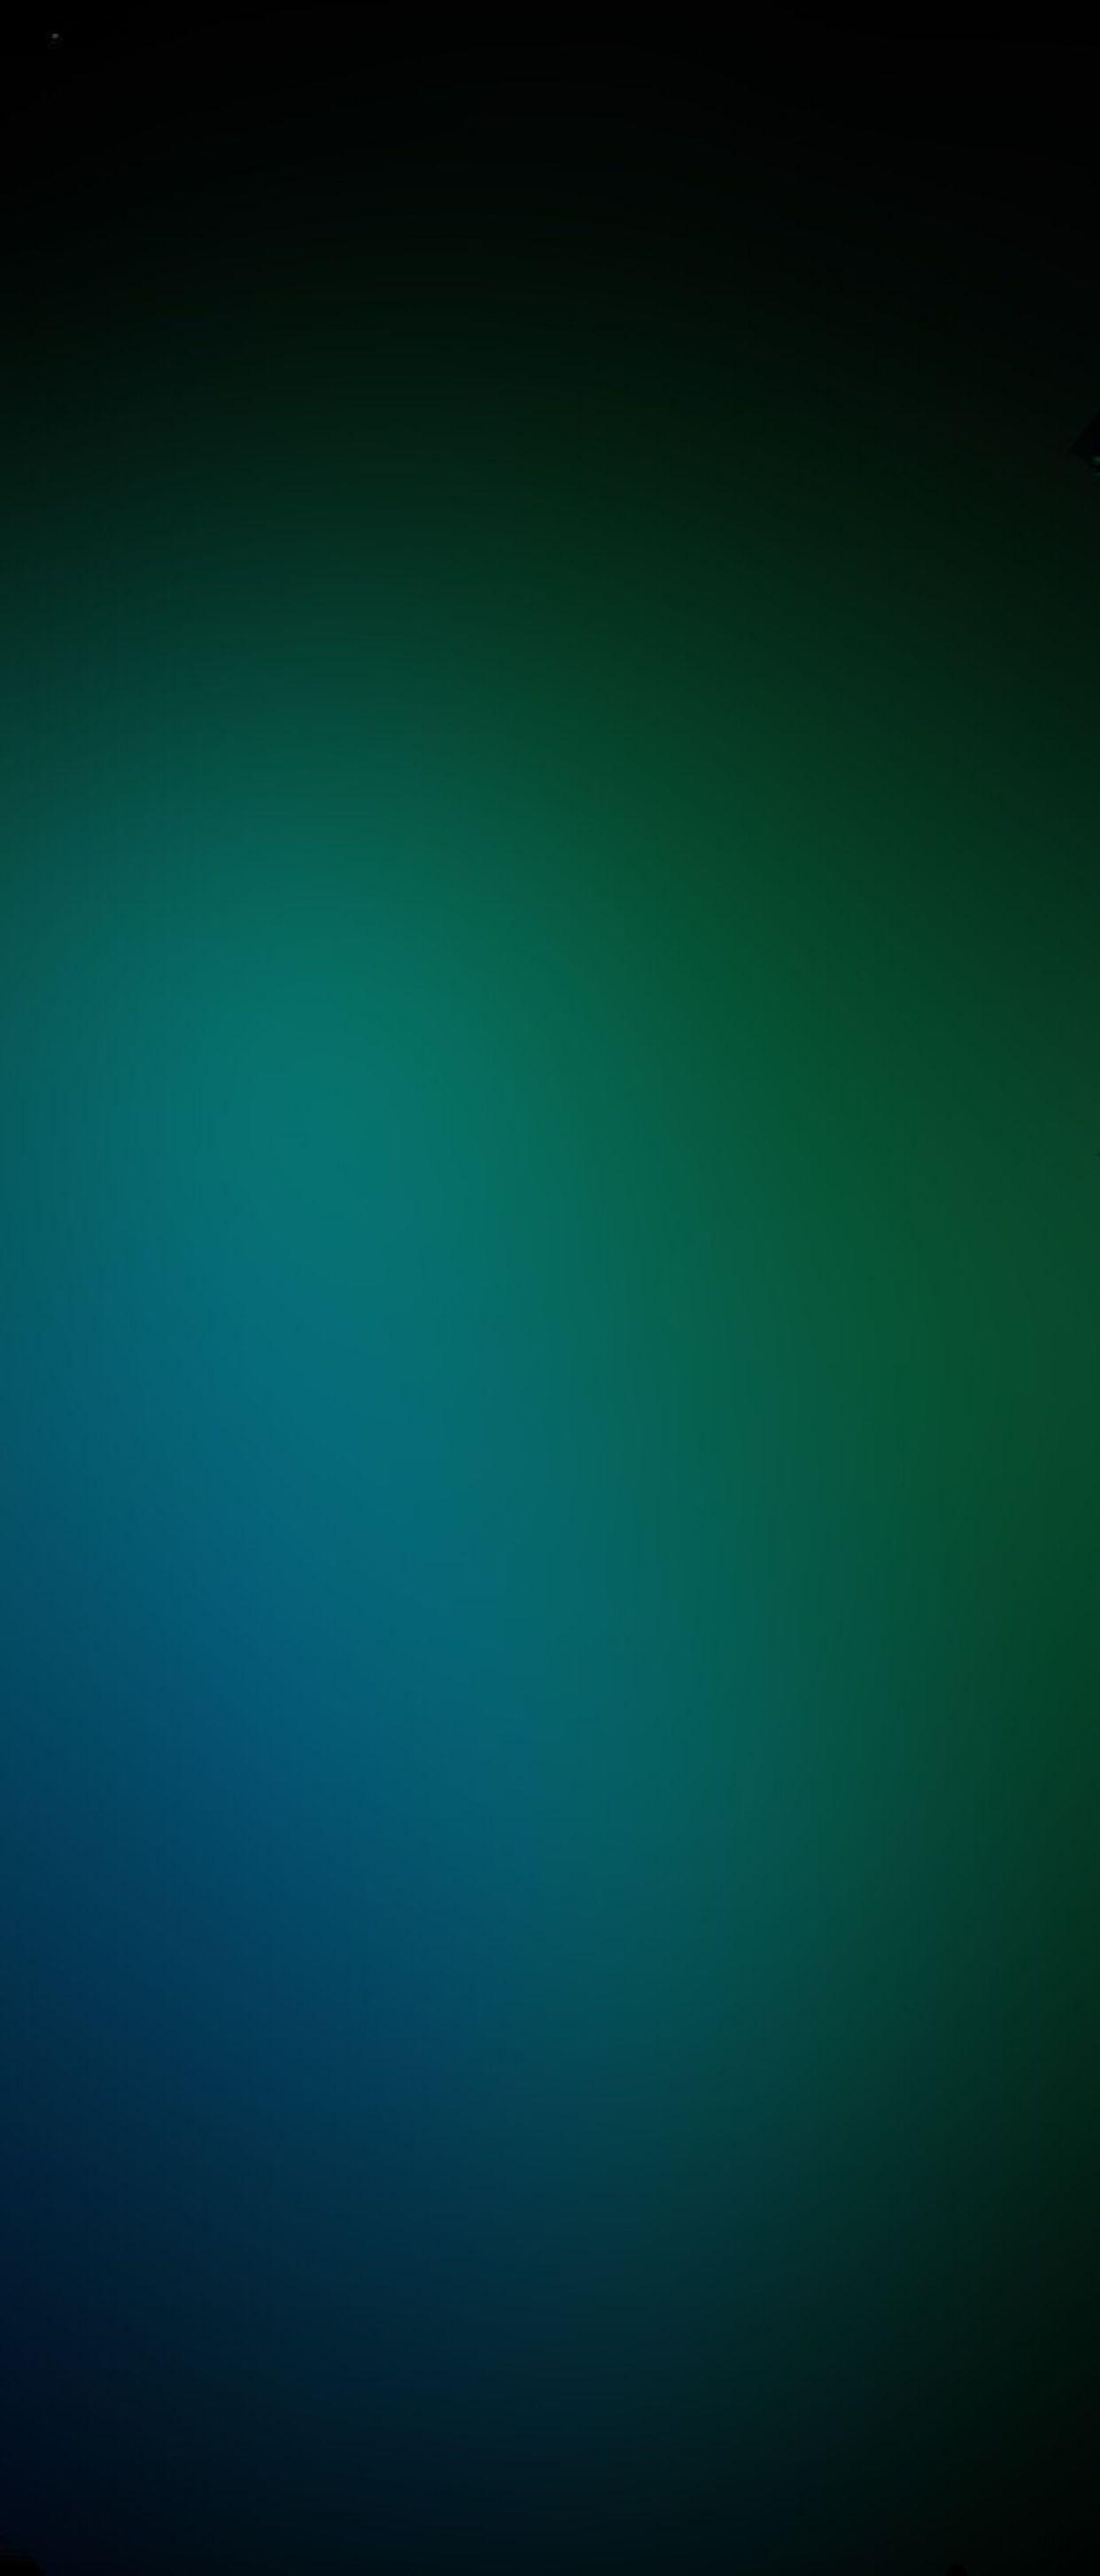 Green Wallpaper Clean Galaxy Colour Abstract Samsung